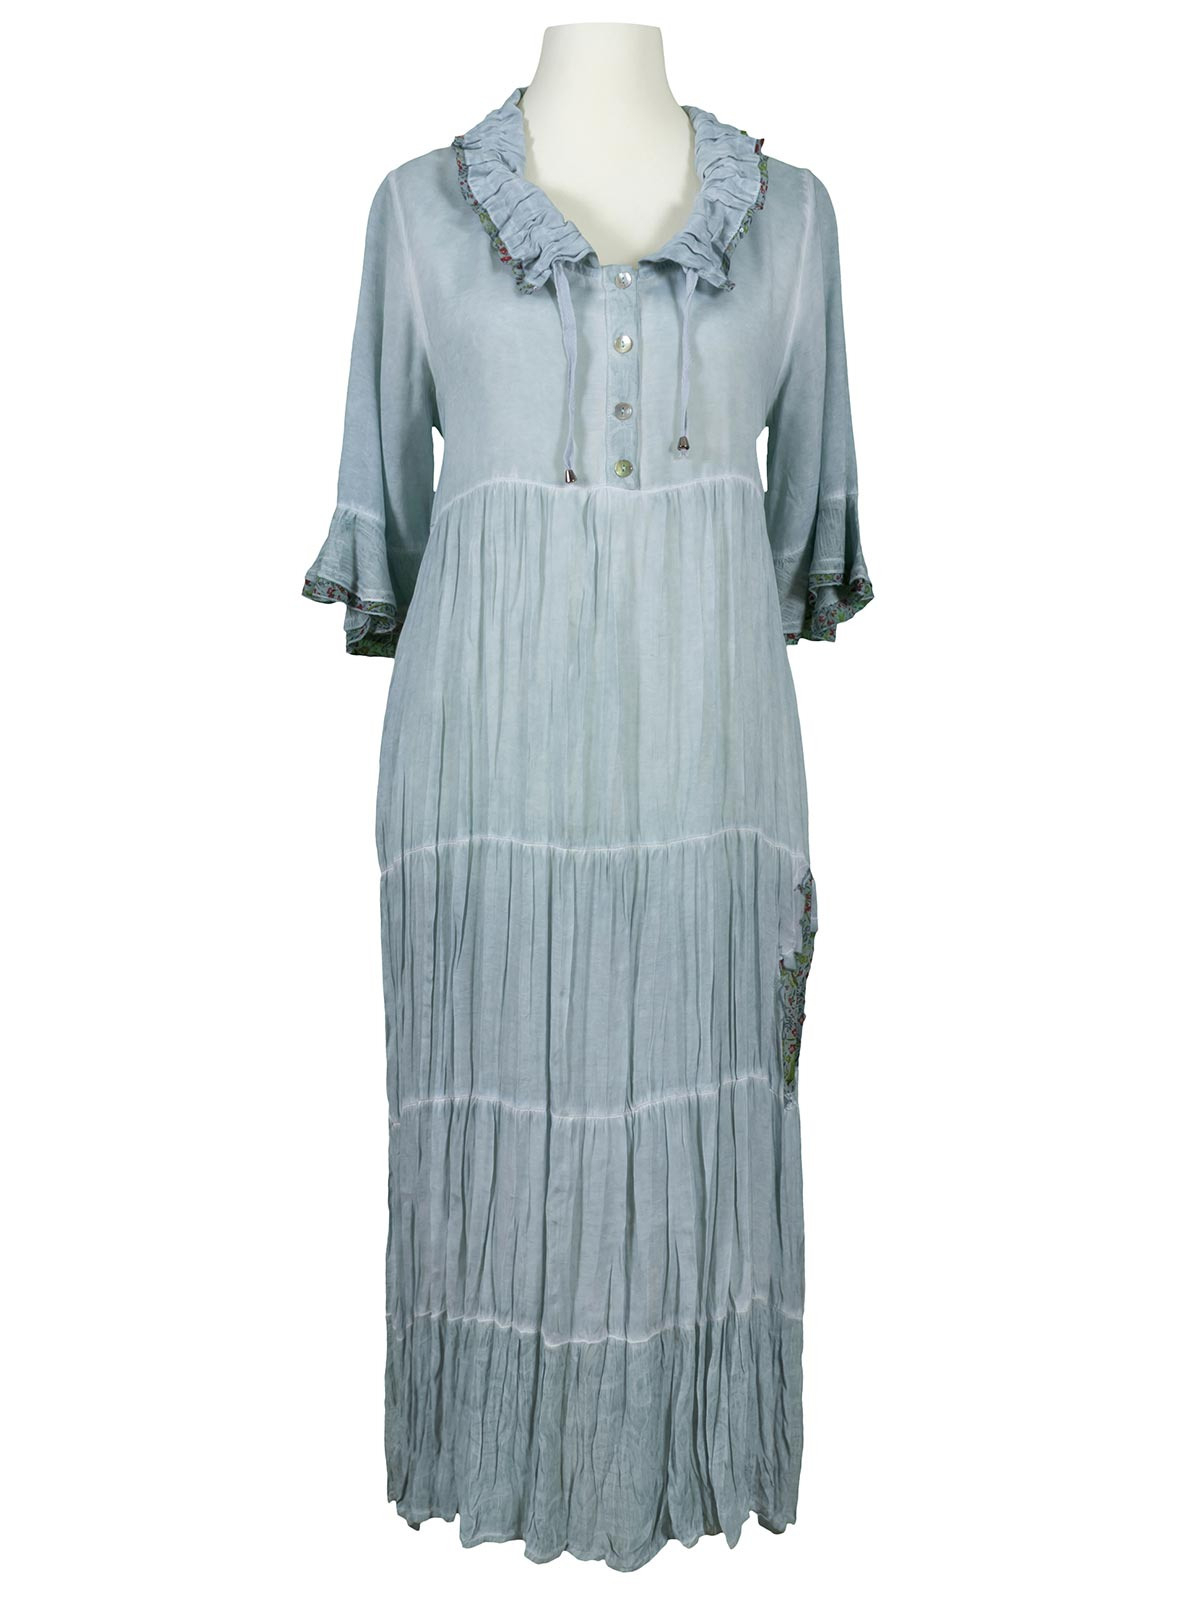 Abend Einzigartig Kleid Hellblau Lang Spezialgebiet10 Schön Kleid Hellblau Lang Boutique